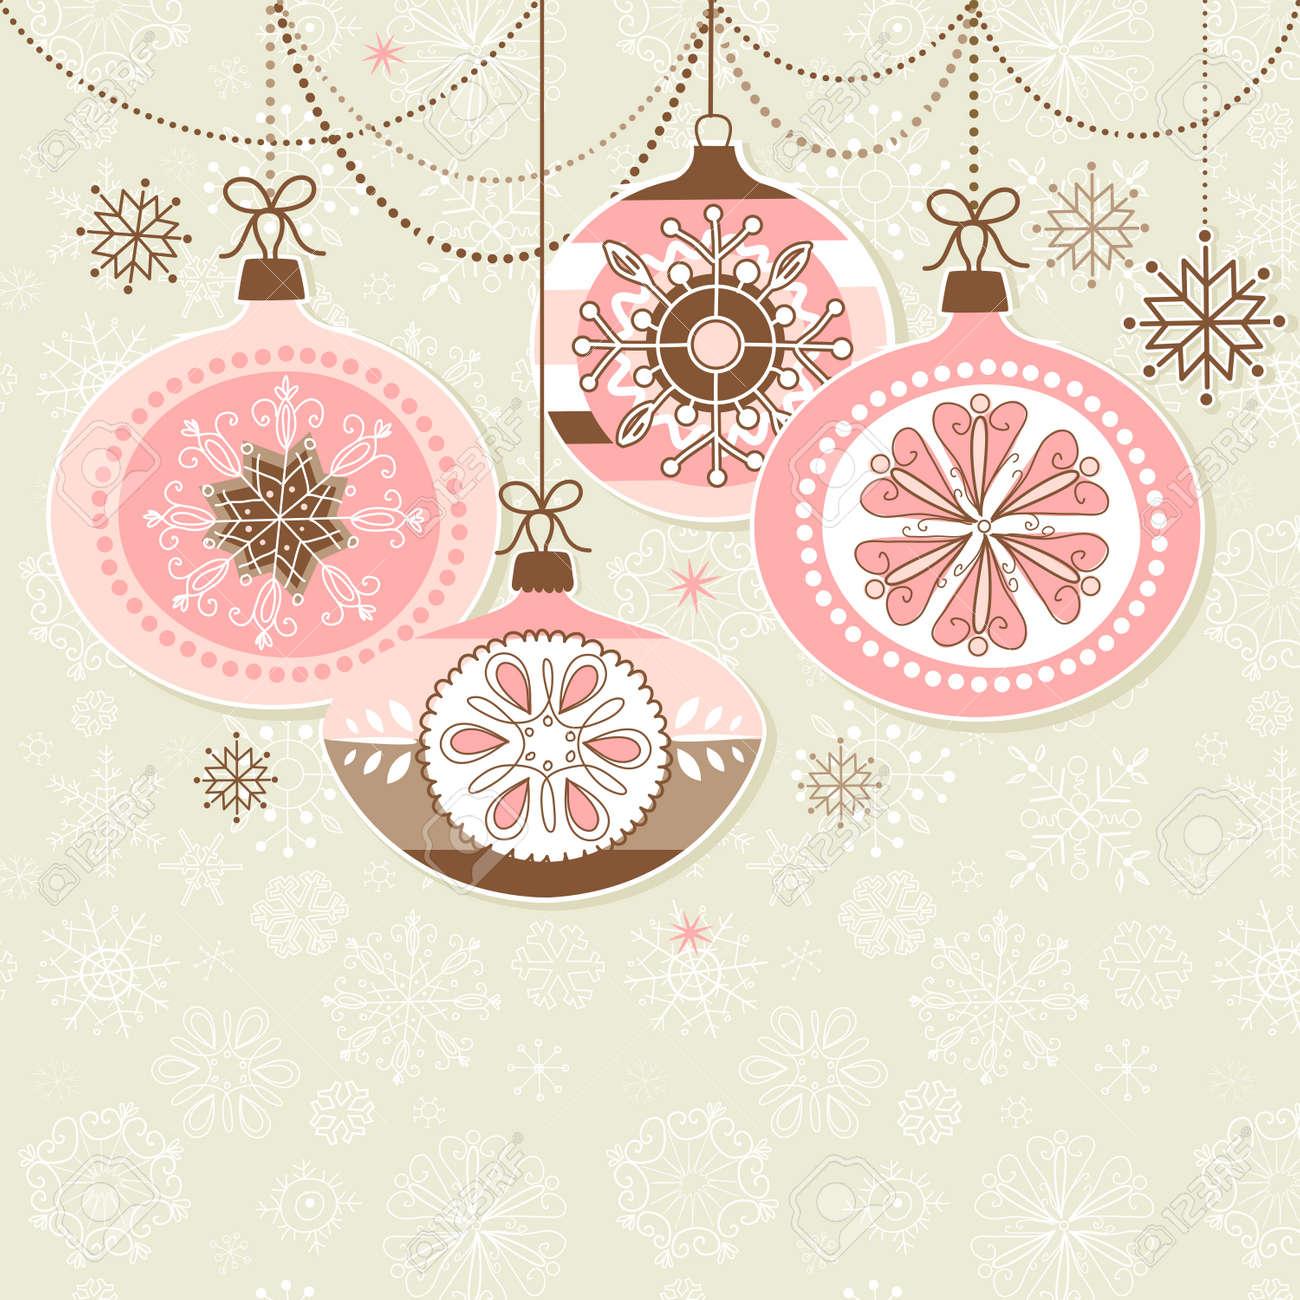 Retro Christmas Ornaments Stock Vector - 16681249